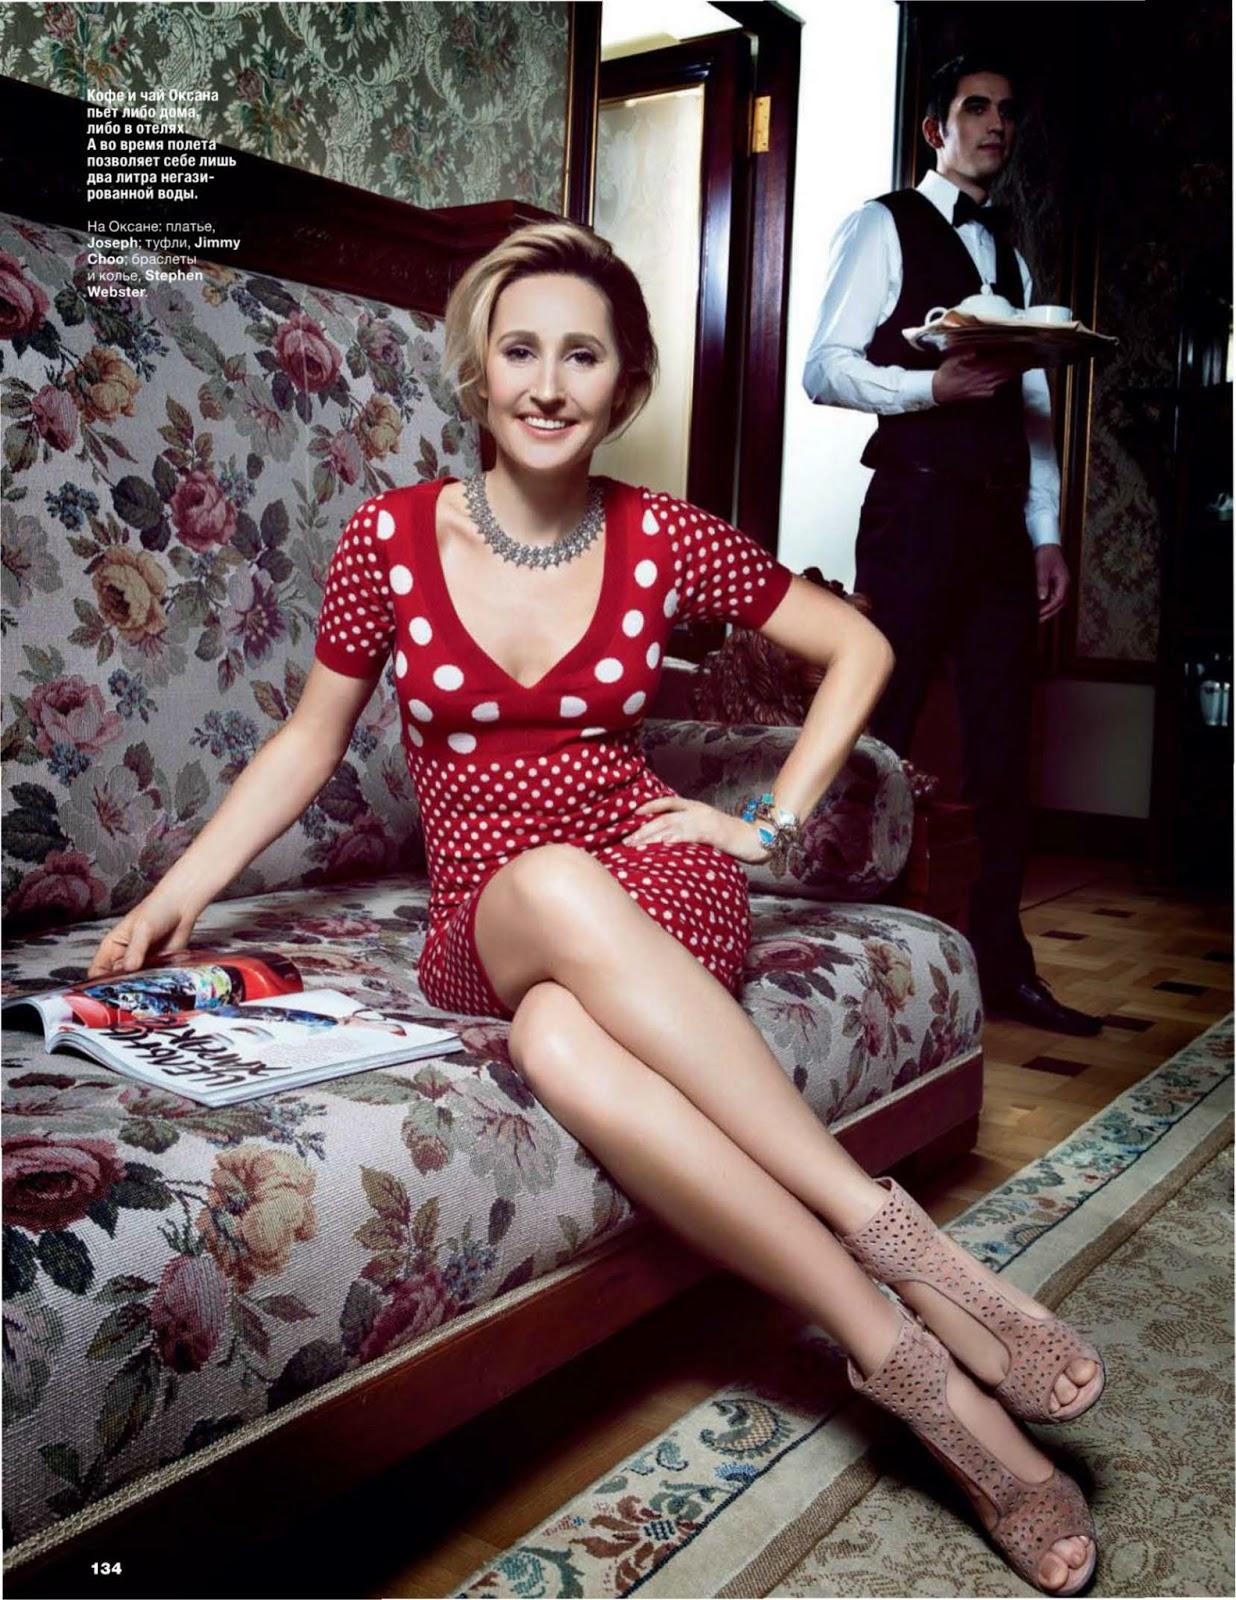 Young Svetlana Ivanova naked (42 photos), Pussy, Hot, Selfie, butt 2020